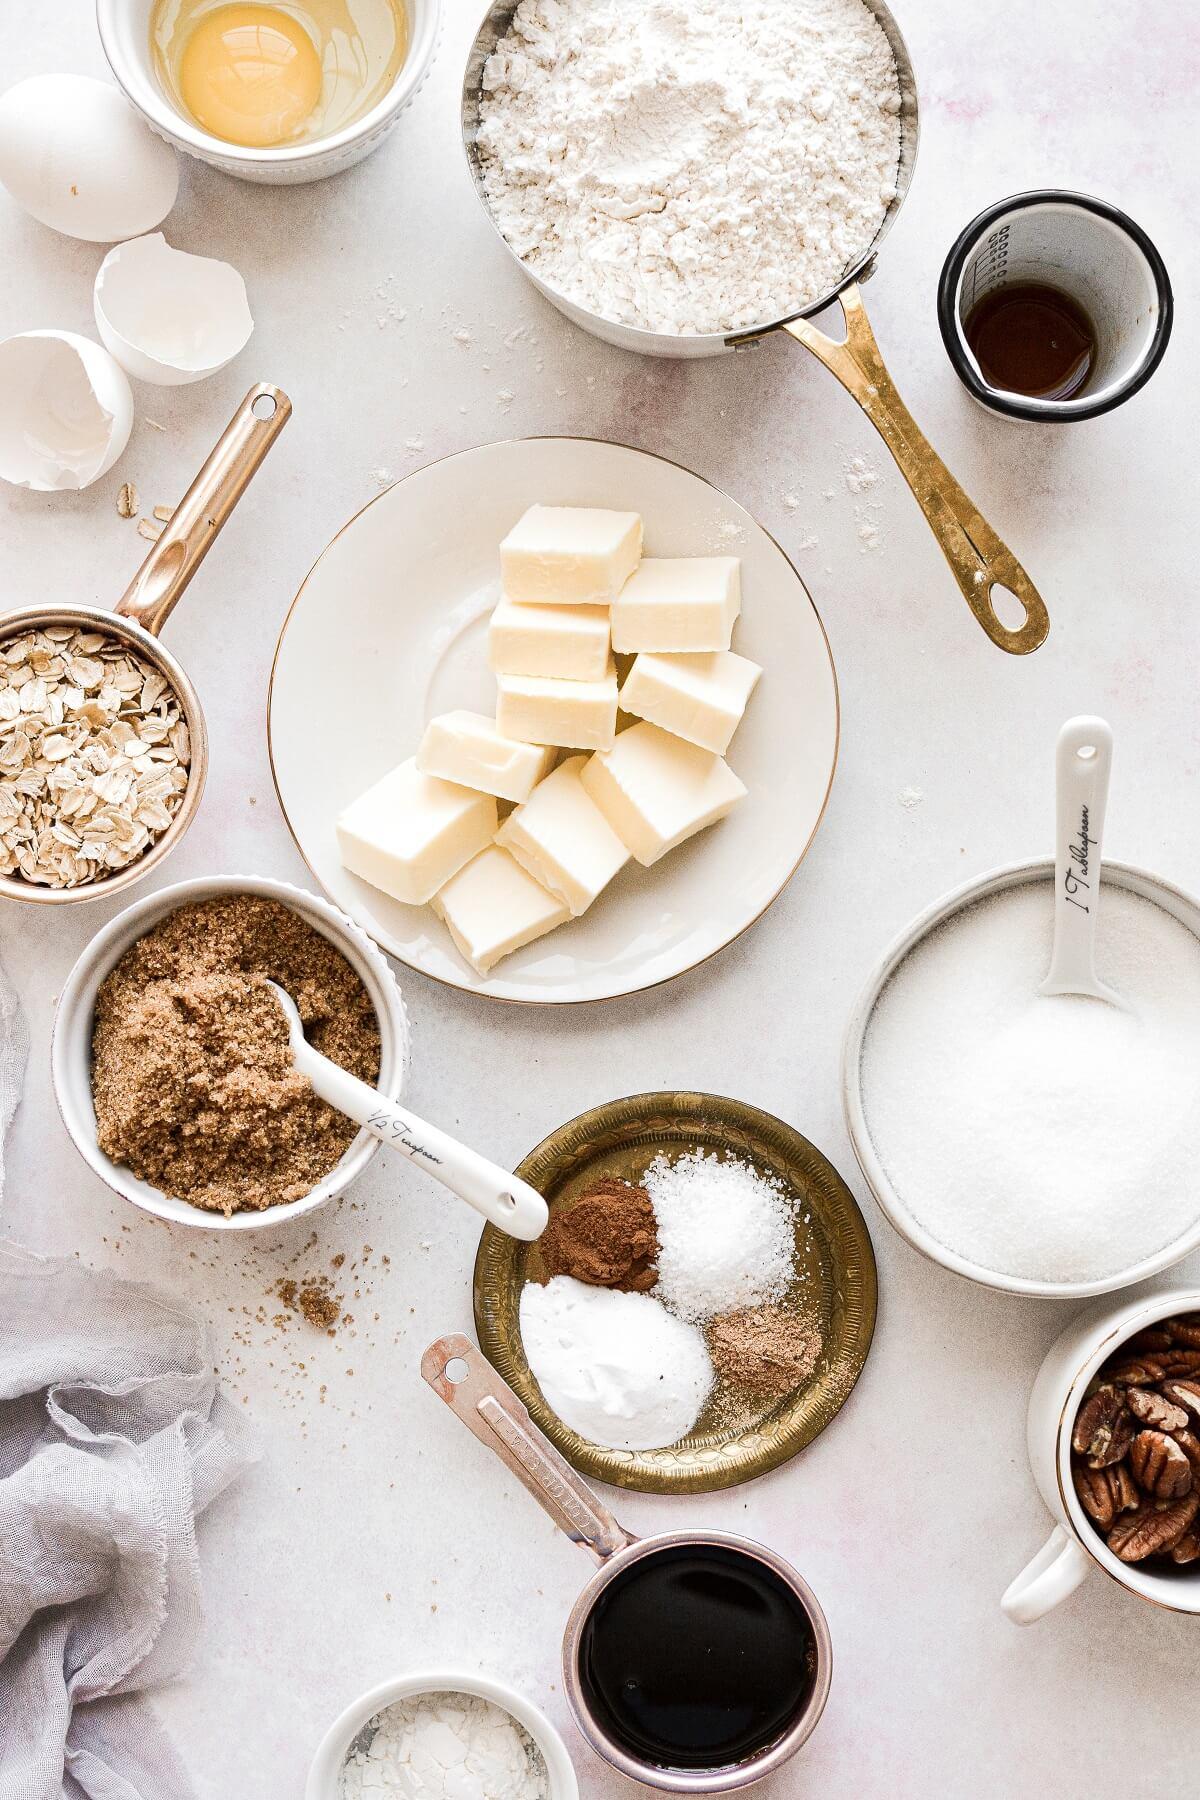 Ingredients for making appledoodles.